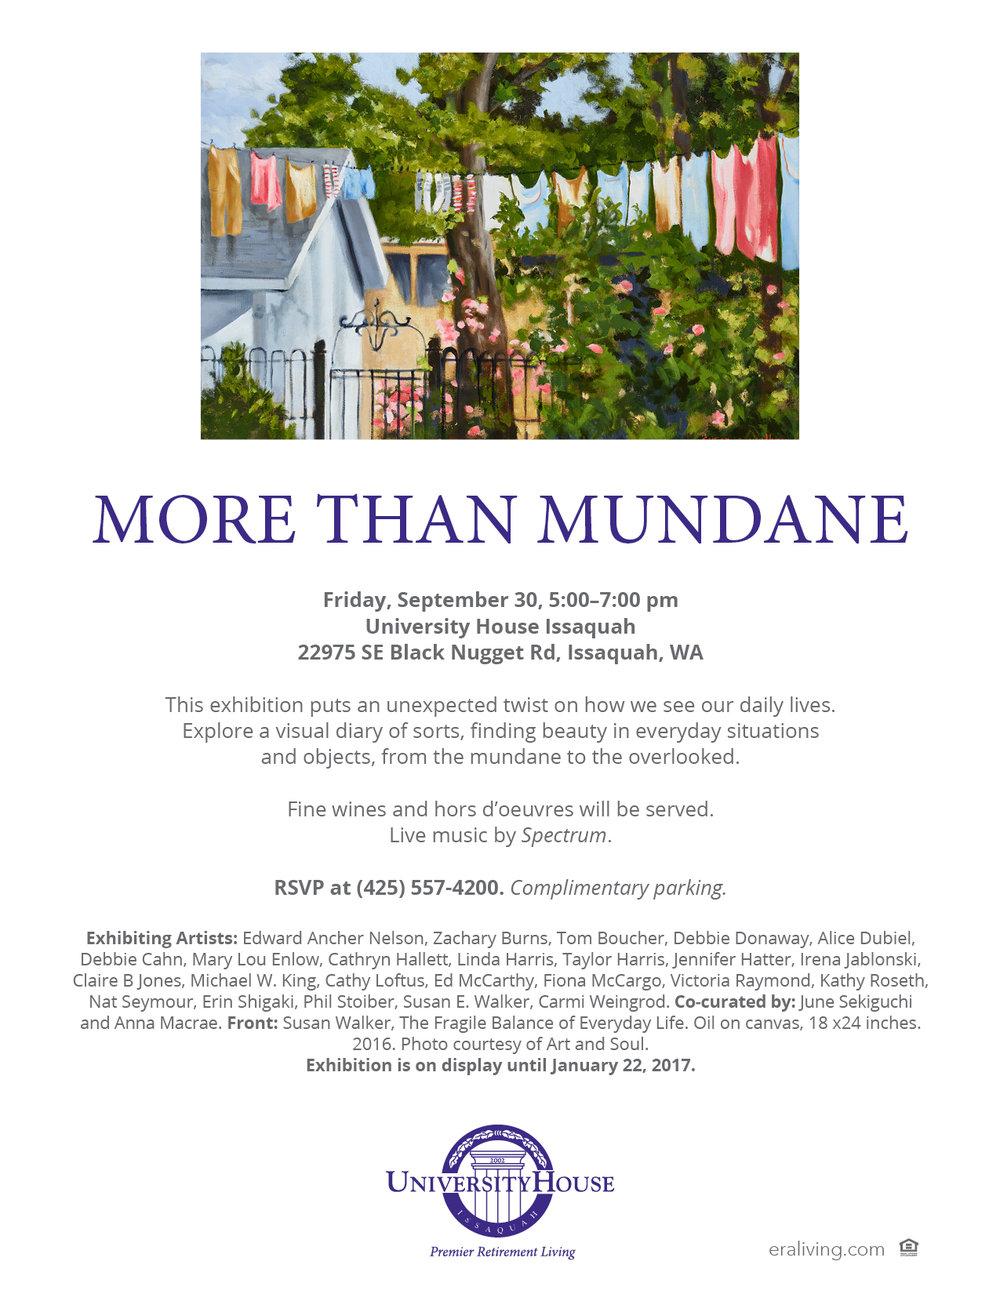 More Than Mundane_9-12-2016.jpg